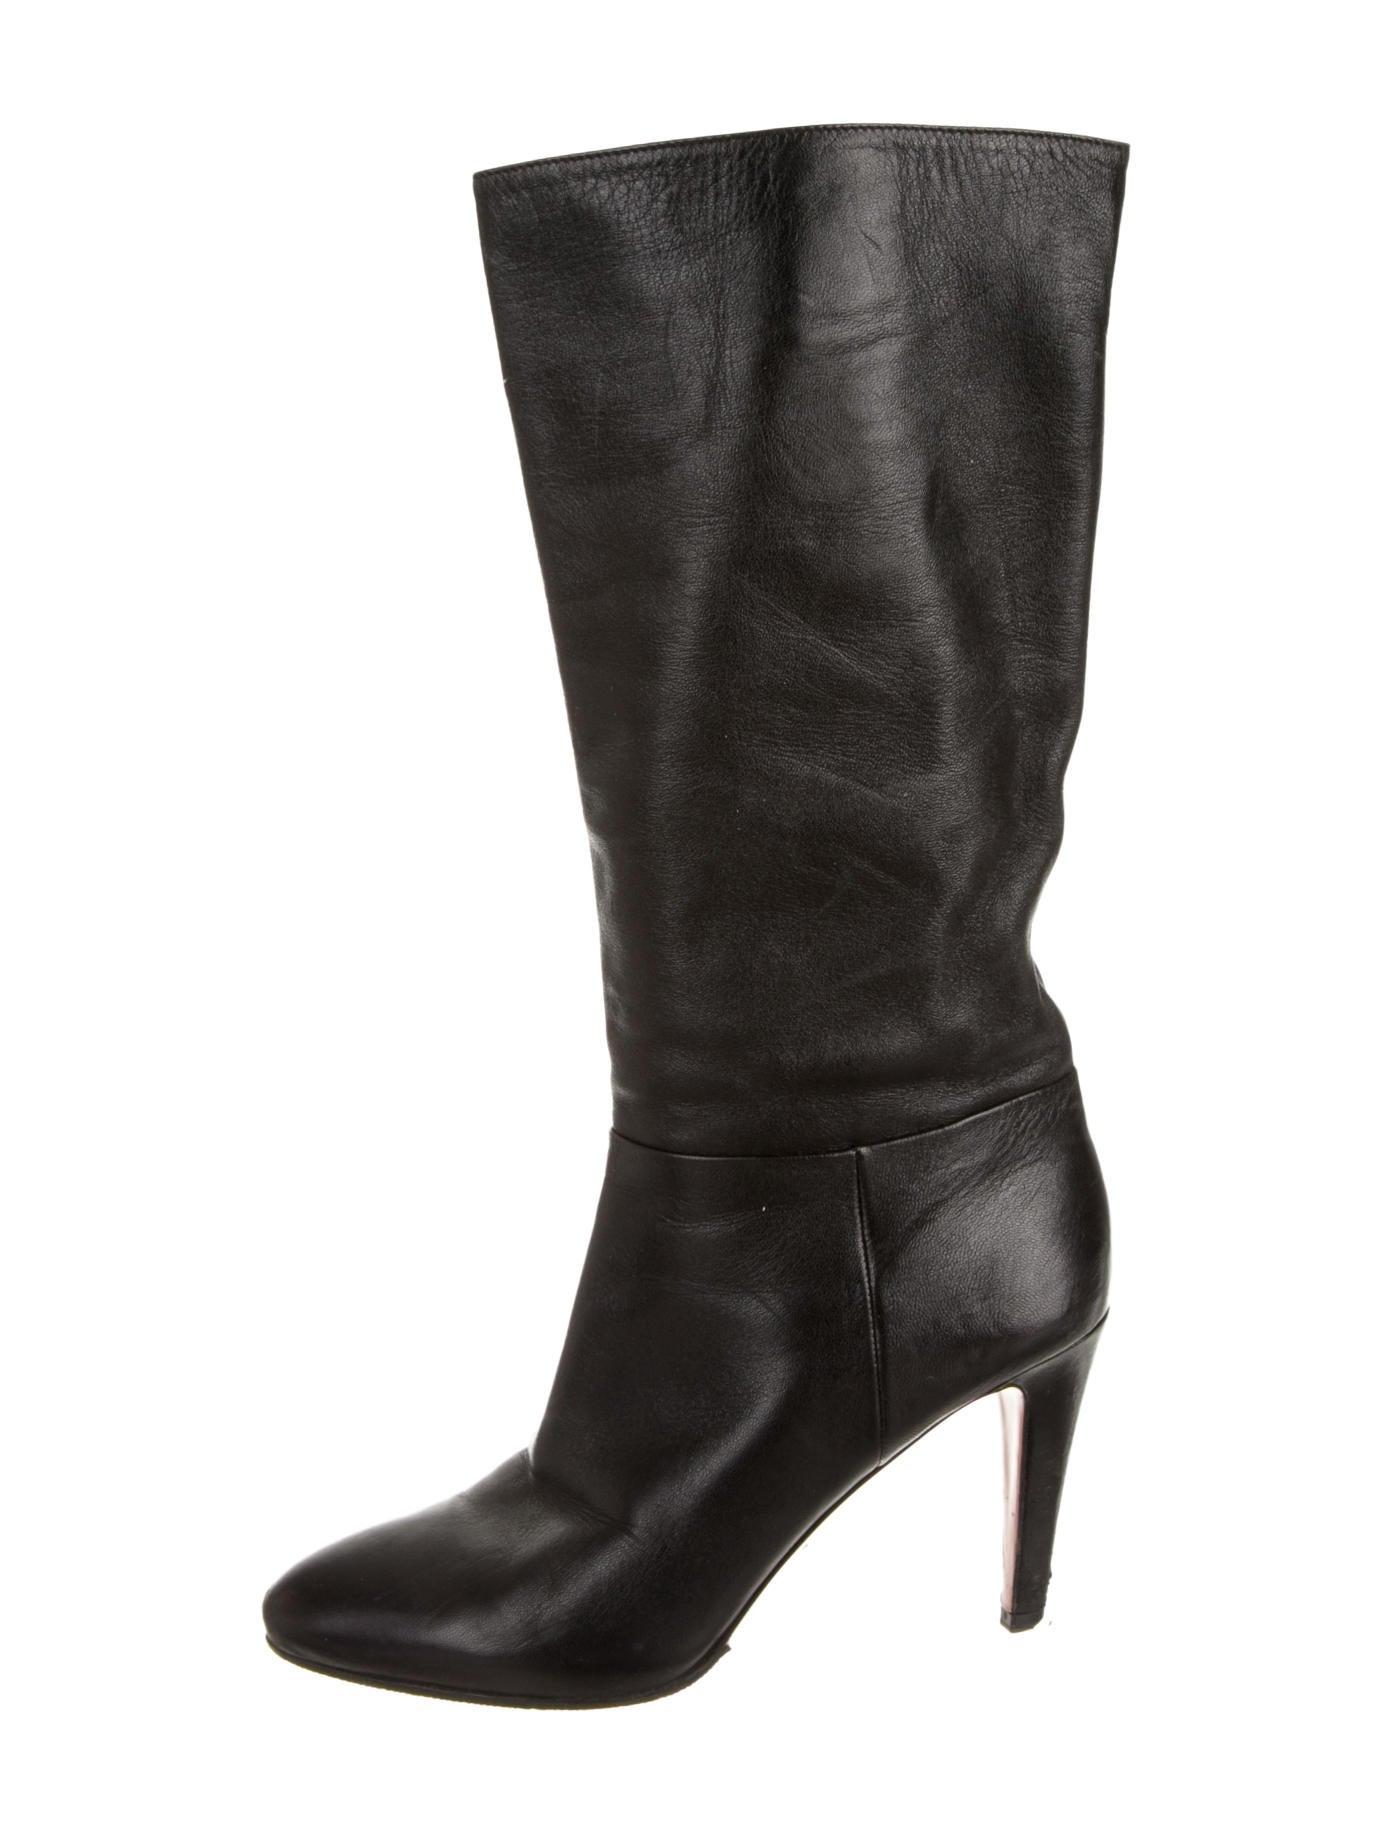 Prada Boots - Shoes - PRA62078 | The RealReal